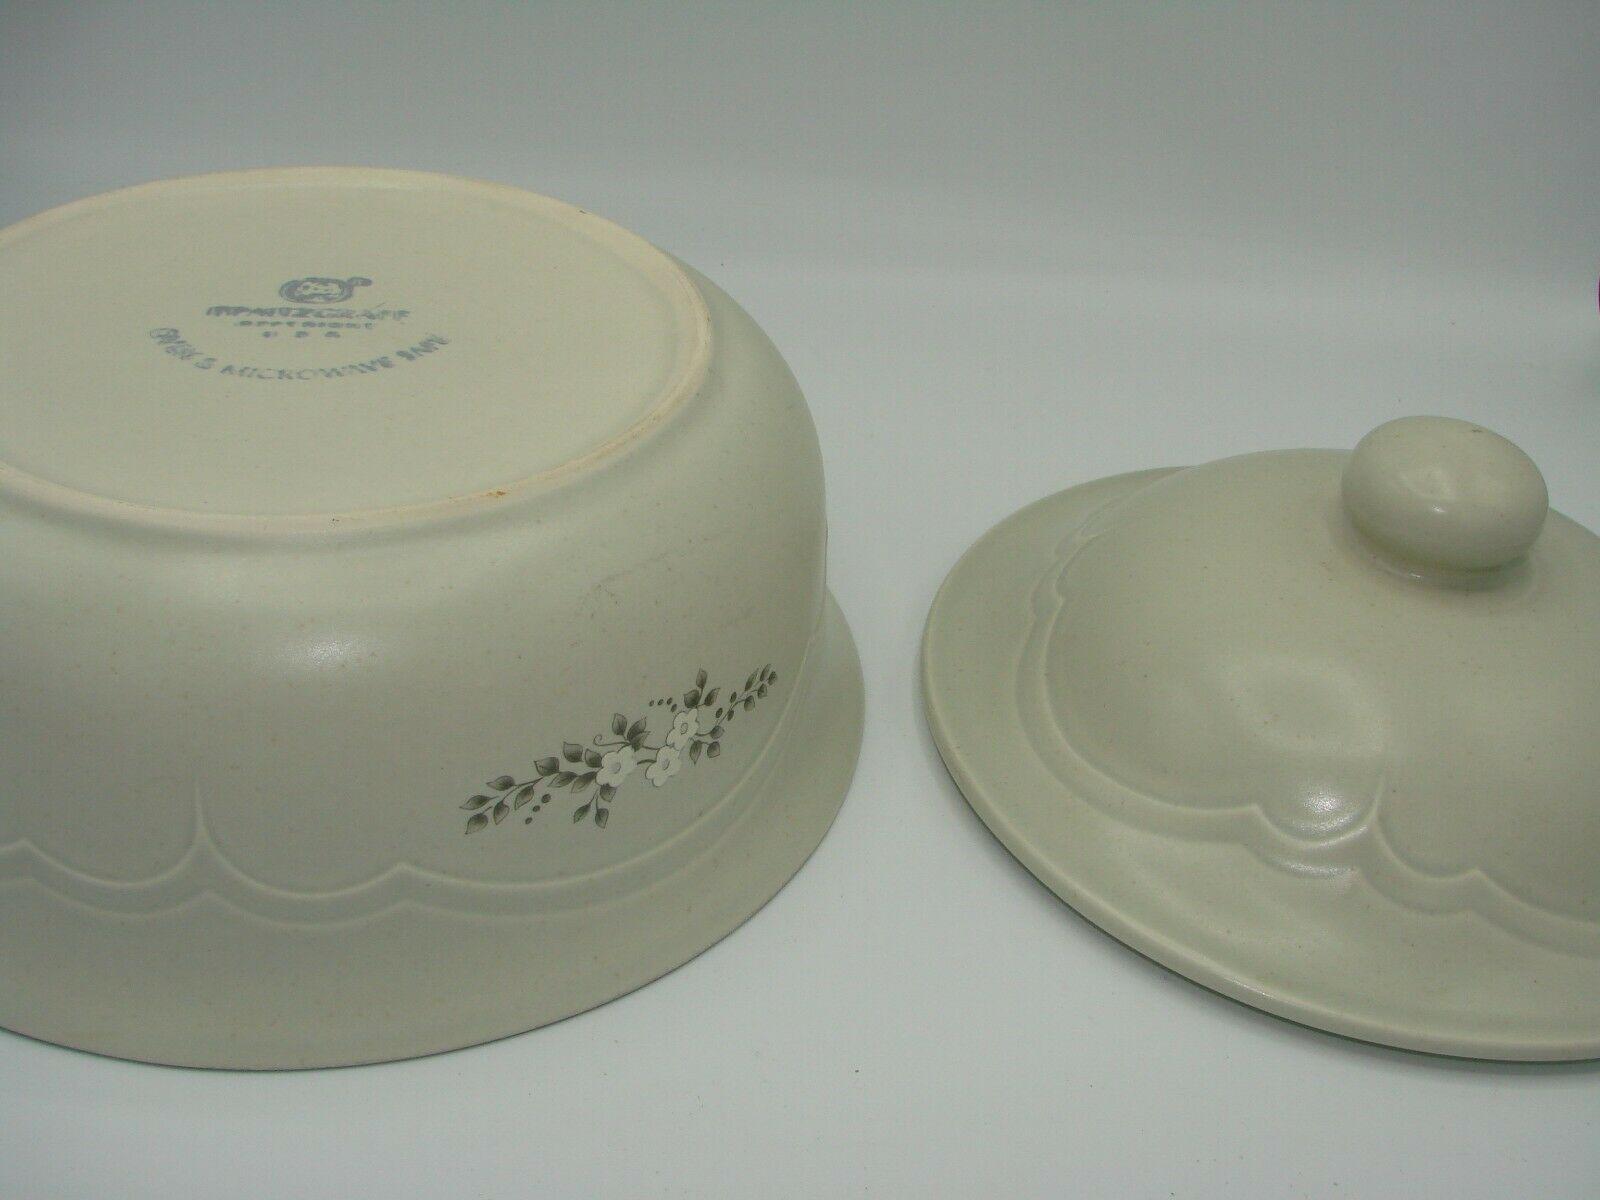 Pristine Pfaltzgraff Heirloom Covered Casserole Dish 8.75 2 Quart White Flowers image 7